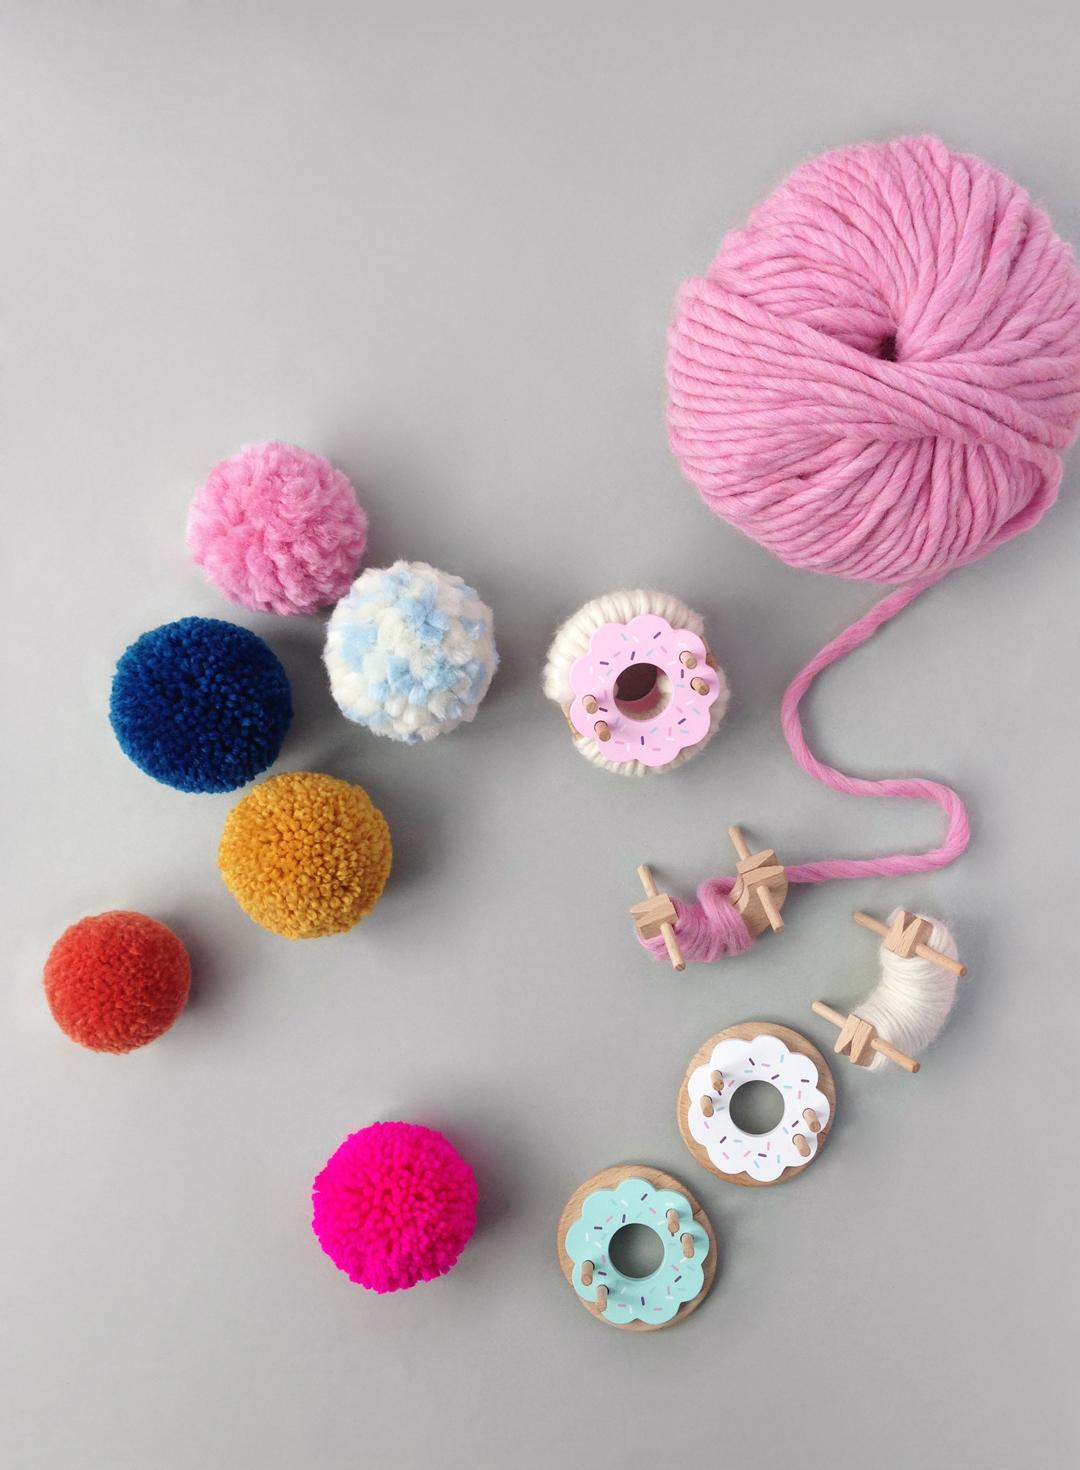 pompom-valentines-day-card-craft-for-kids-pom-maker-mrprintables-7